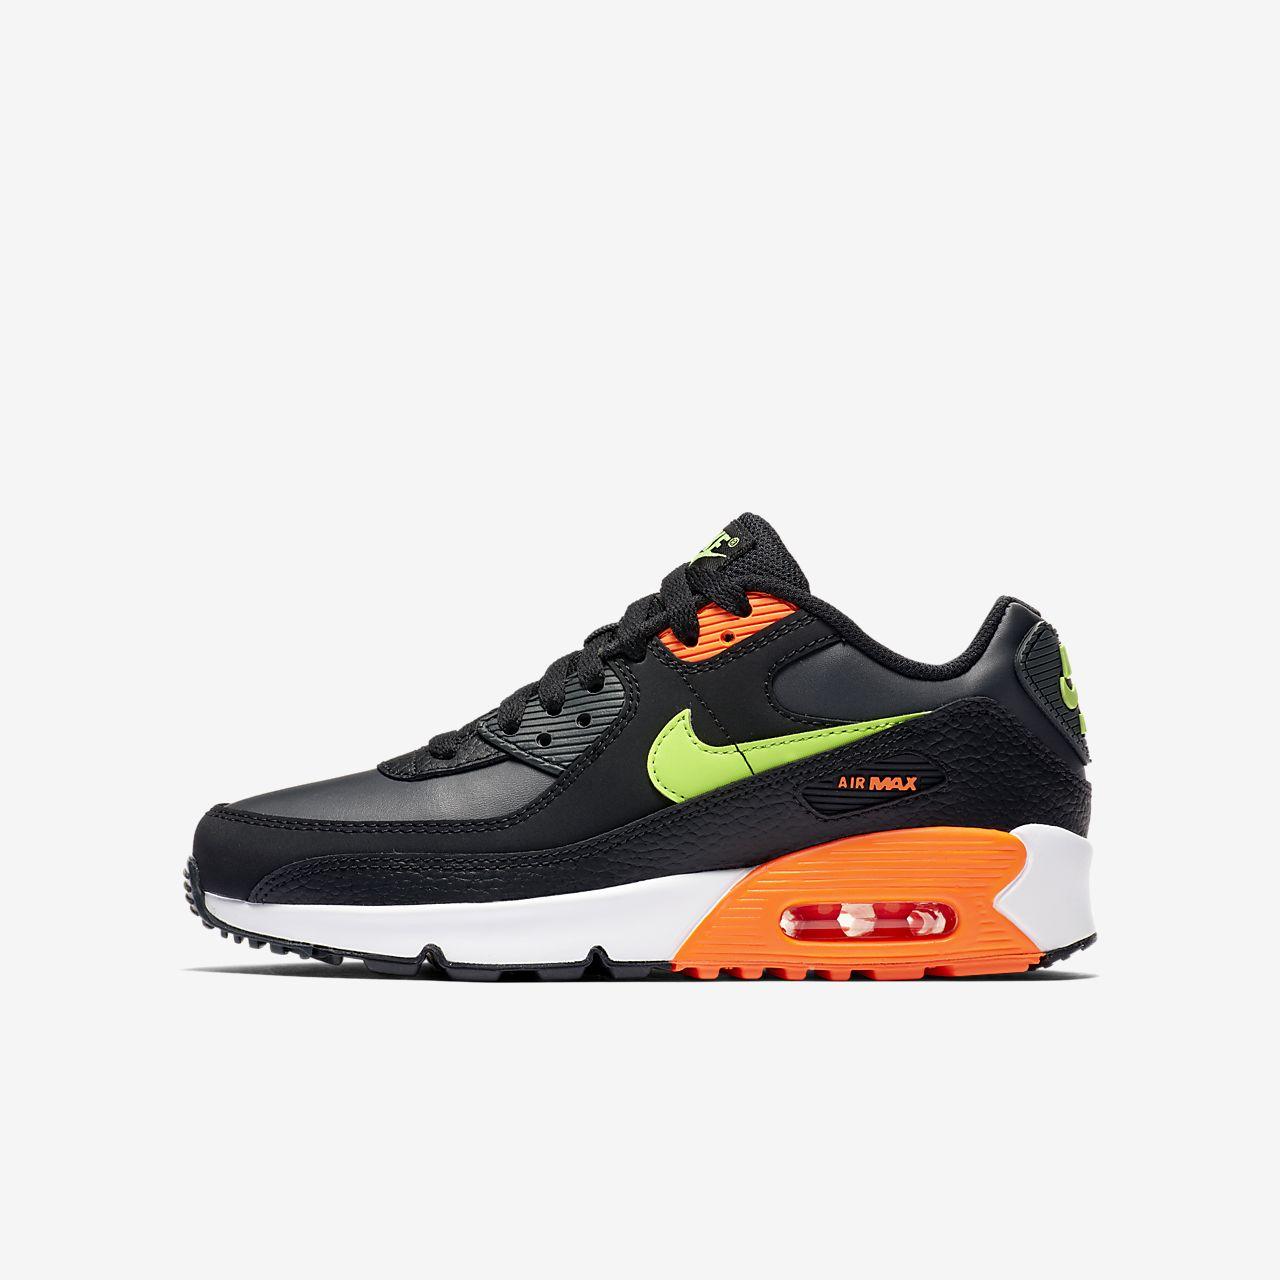 nike air max 90 czarny and orange